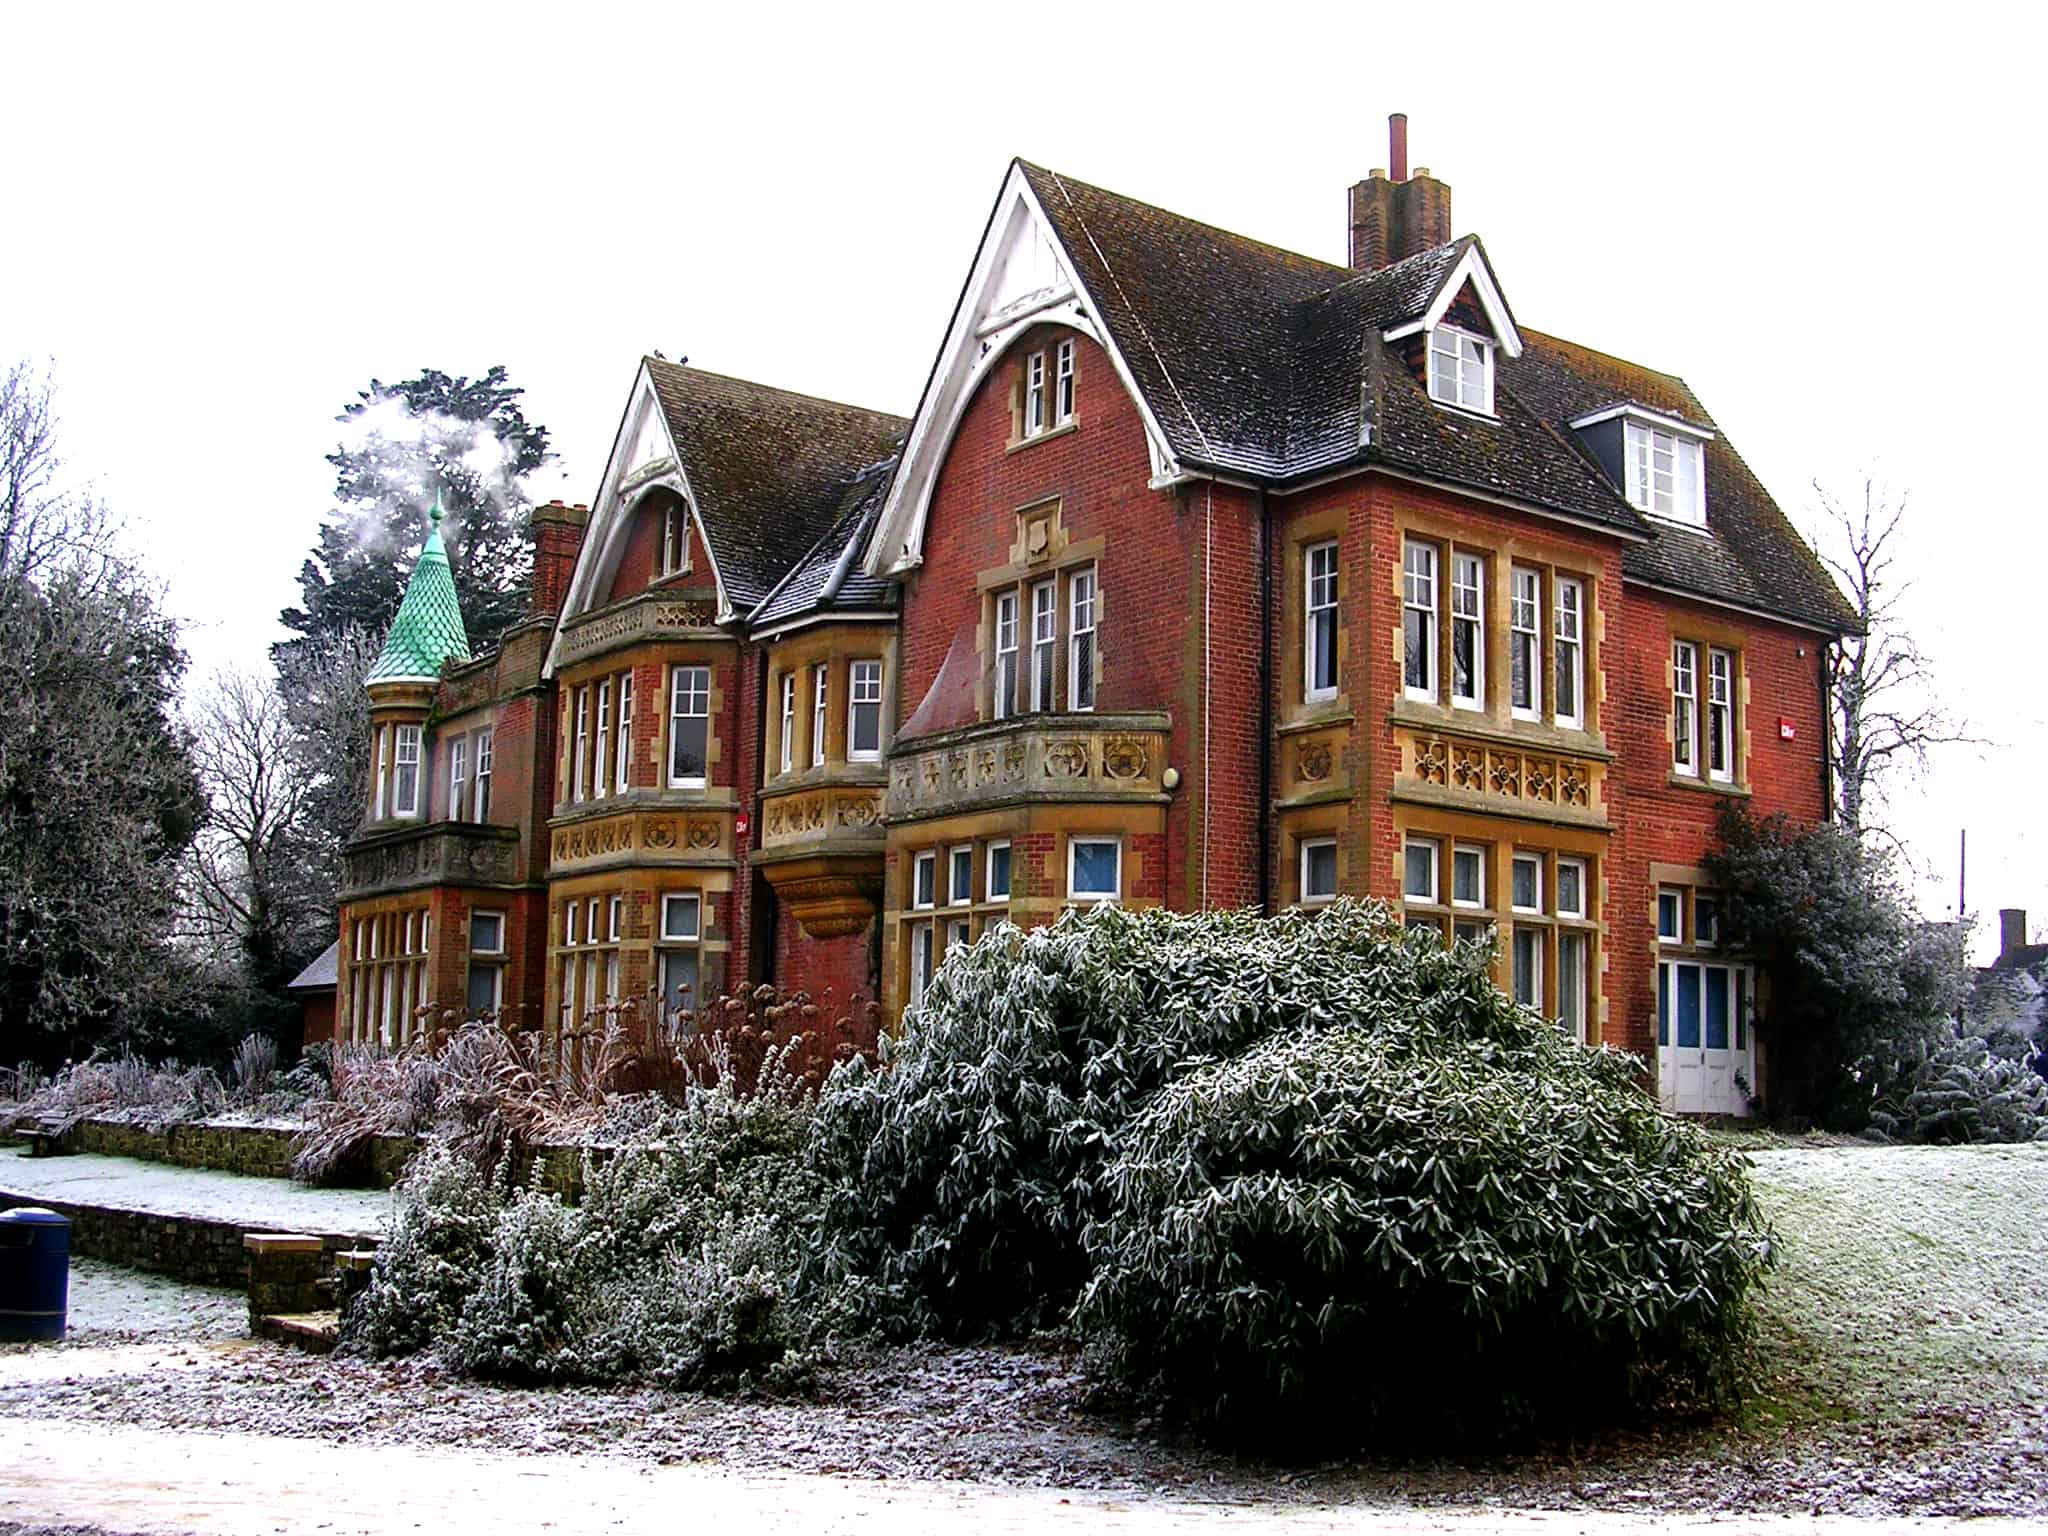 Goff's_Park_House,_Crawley,_Winter_Scene